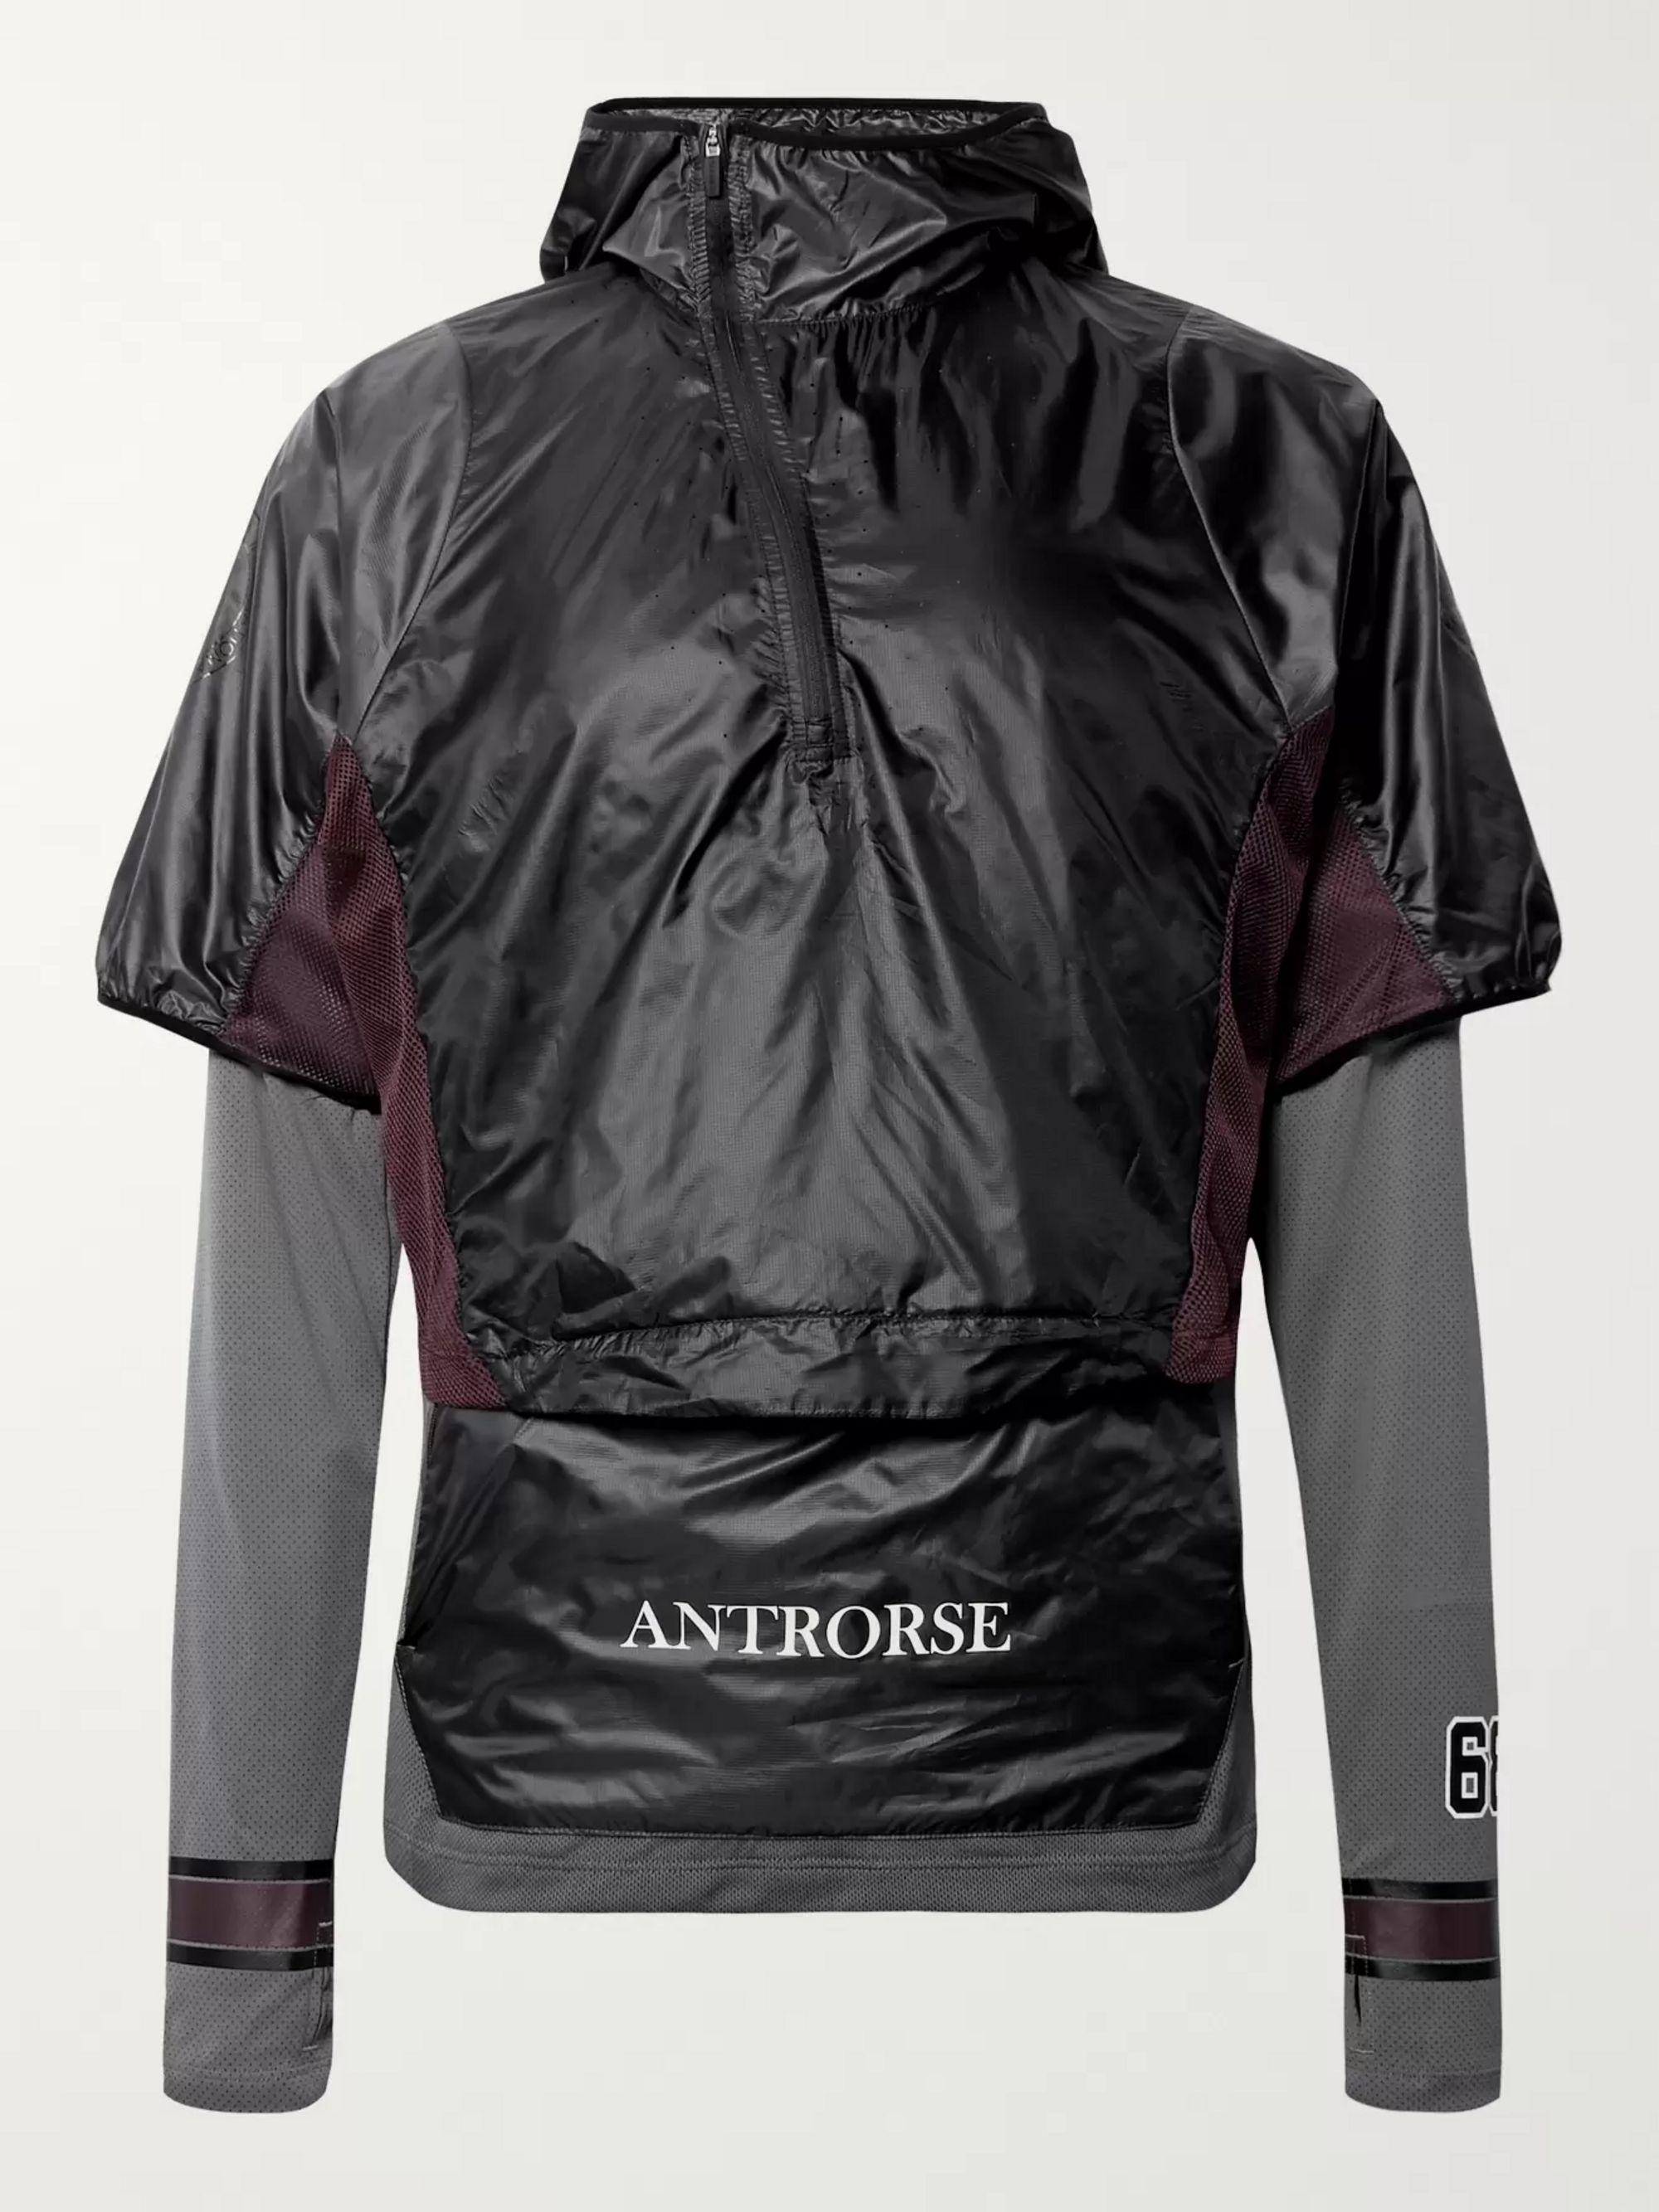 + GYAKUSOU Transform Convertible Dri FIT Mesh and Ripstop Running Jacket